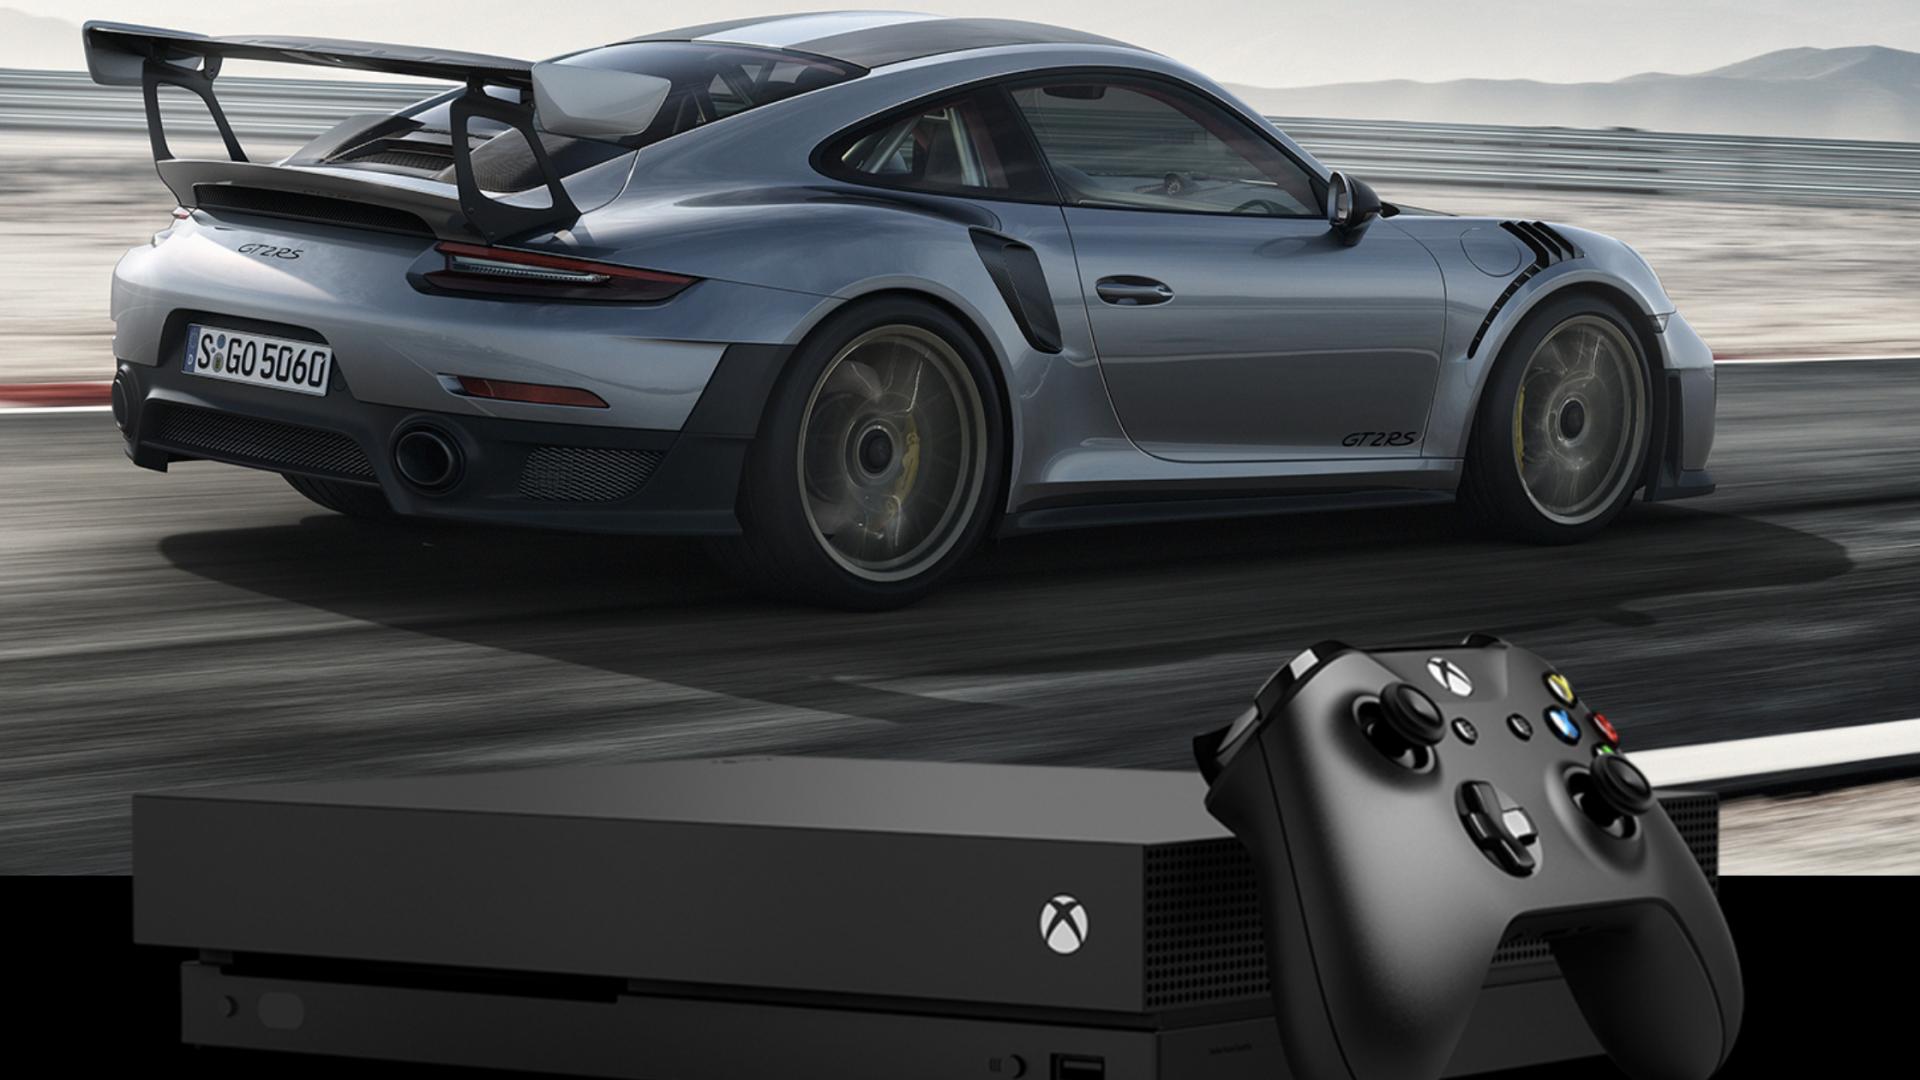 Screen-Shot-2017-11-09-at-6.42.23-pm-1920x1080 Outstanding Porsche 911 Gt2 Wheel Au Cars Trend